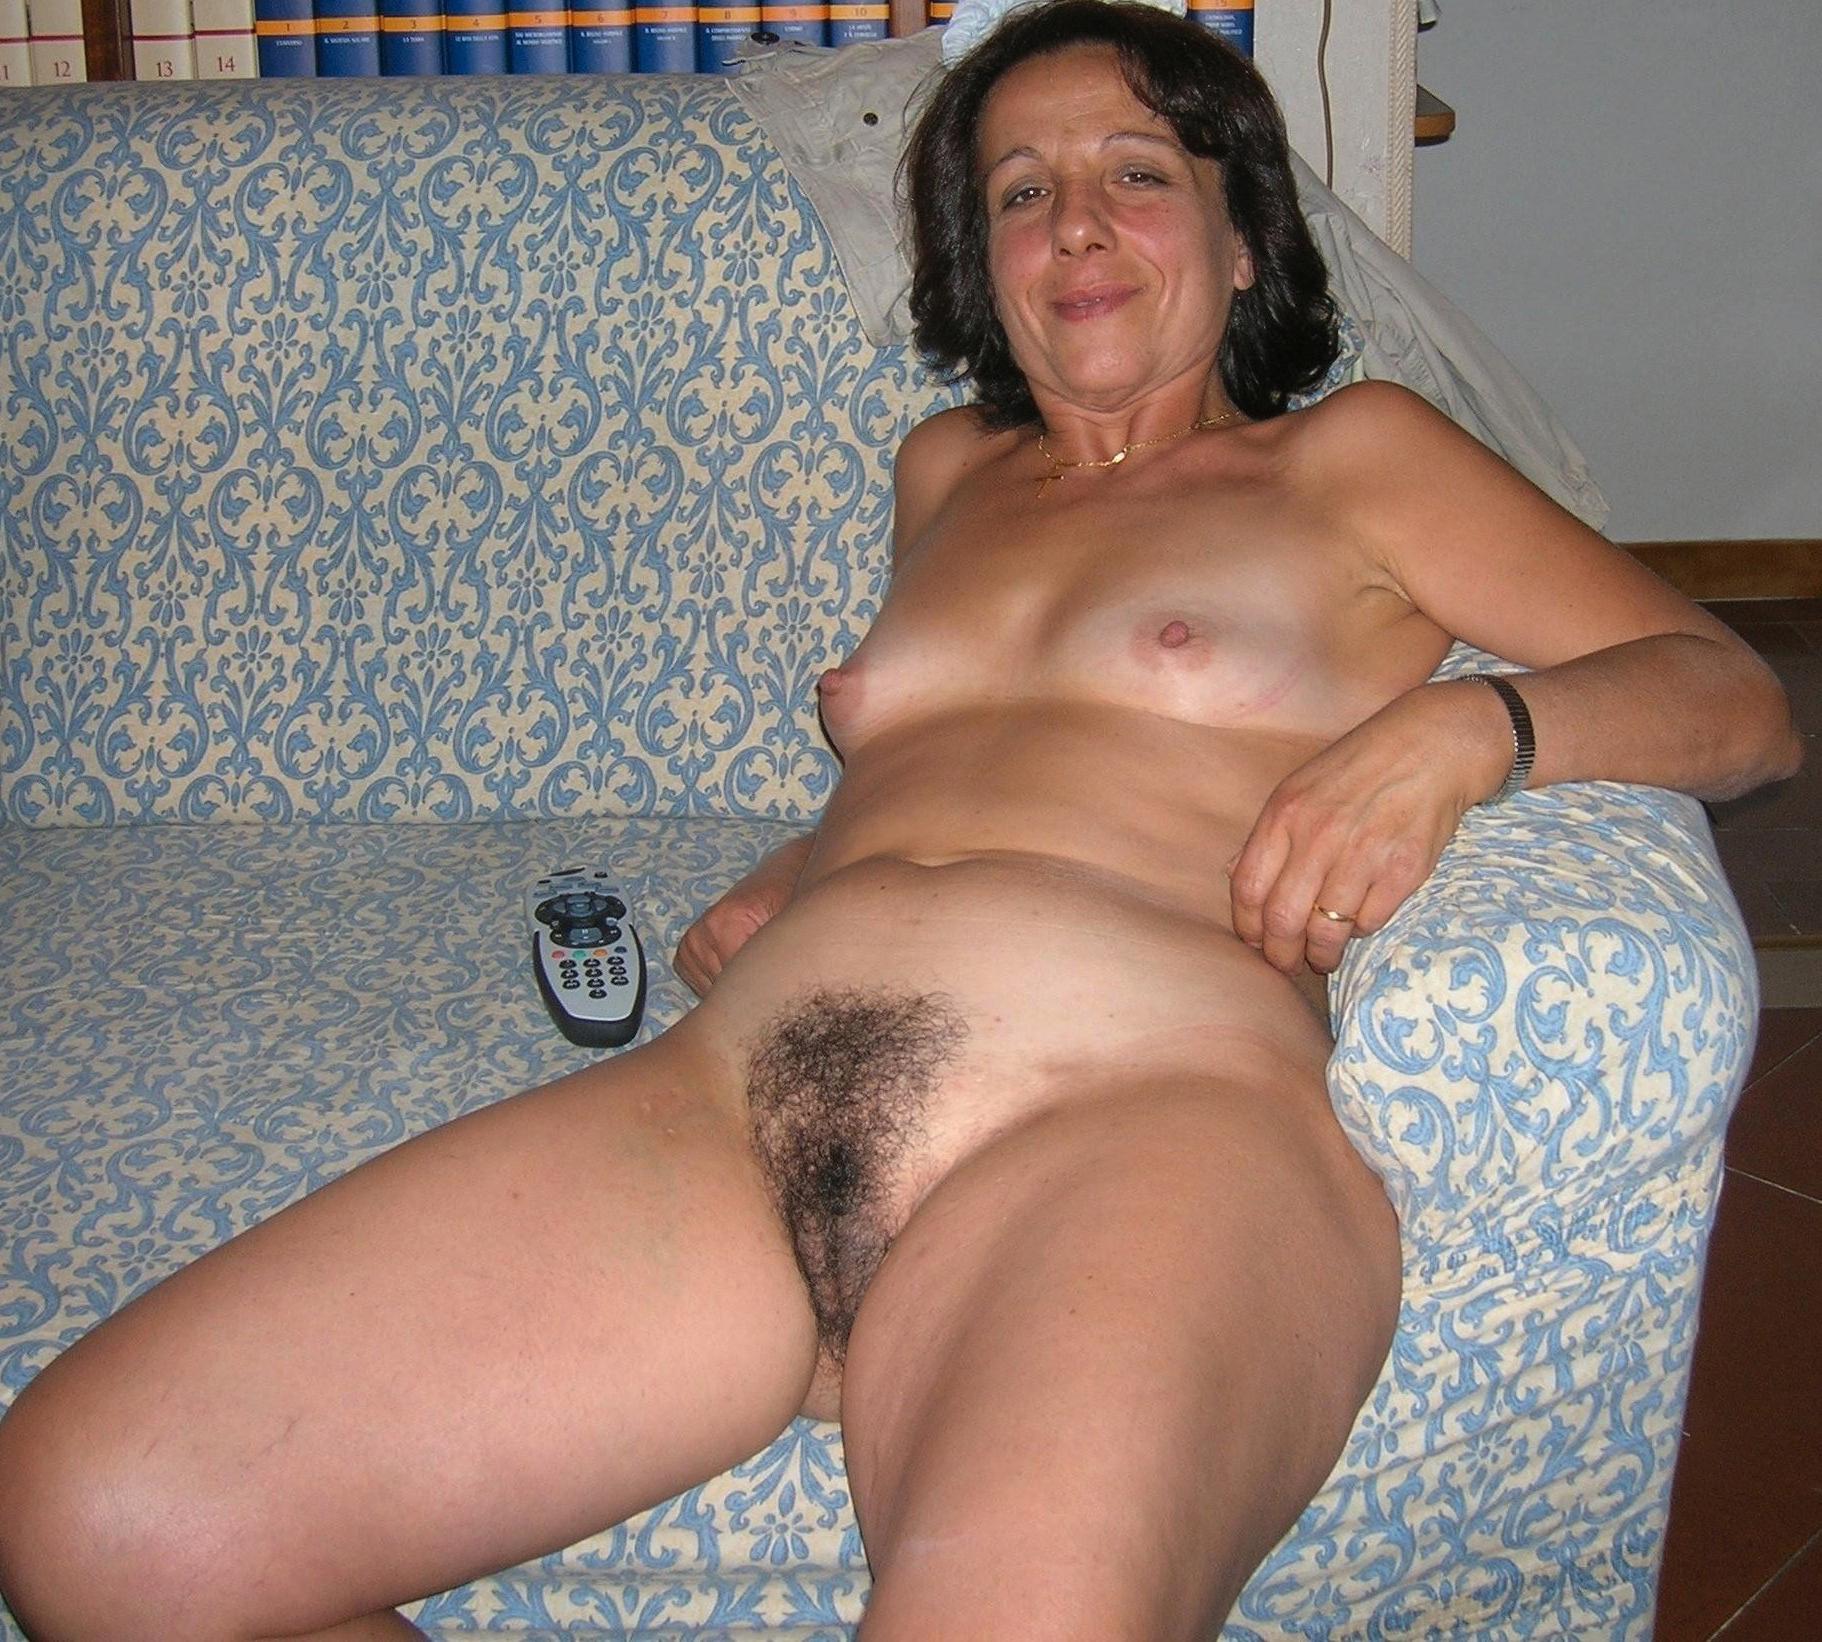 Nude hairy amateur women